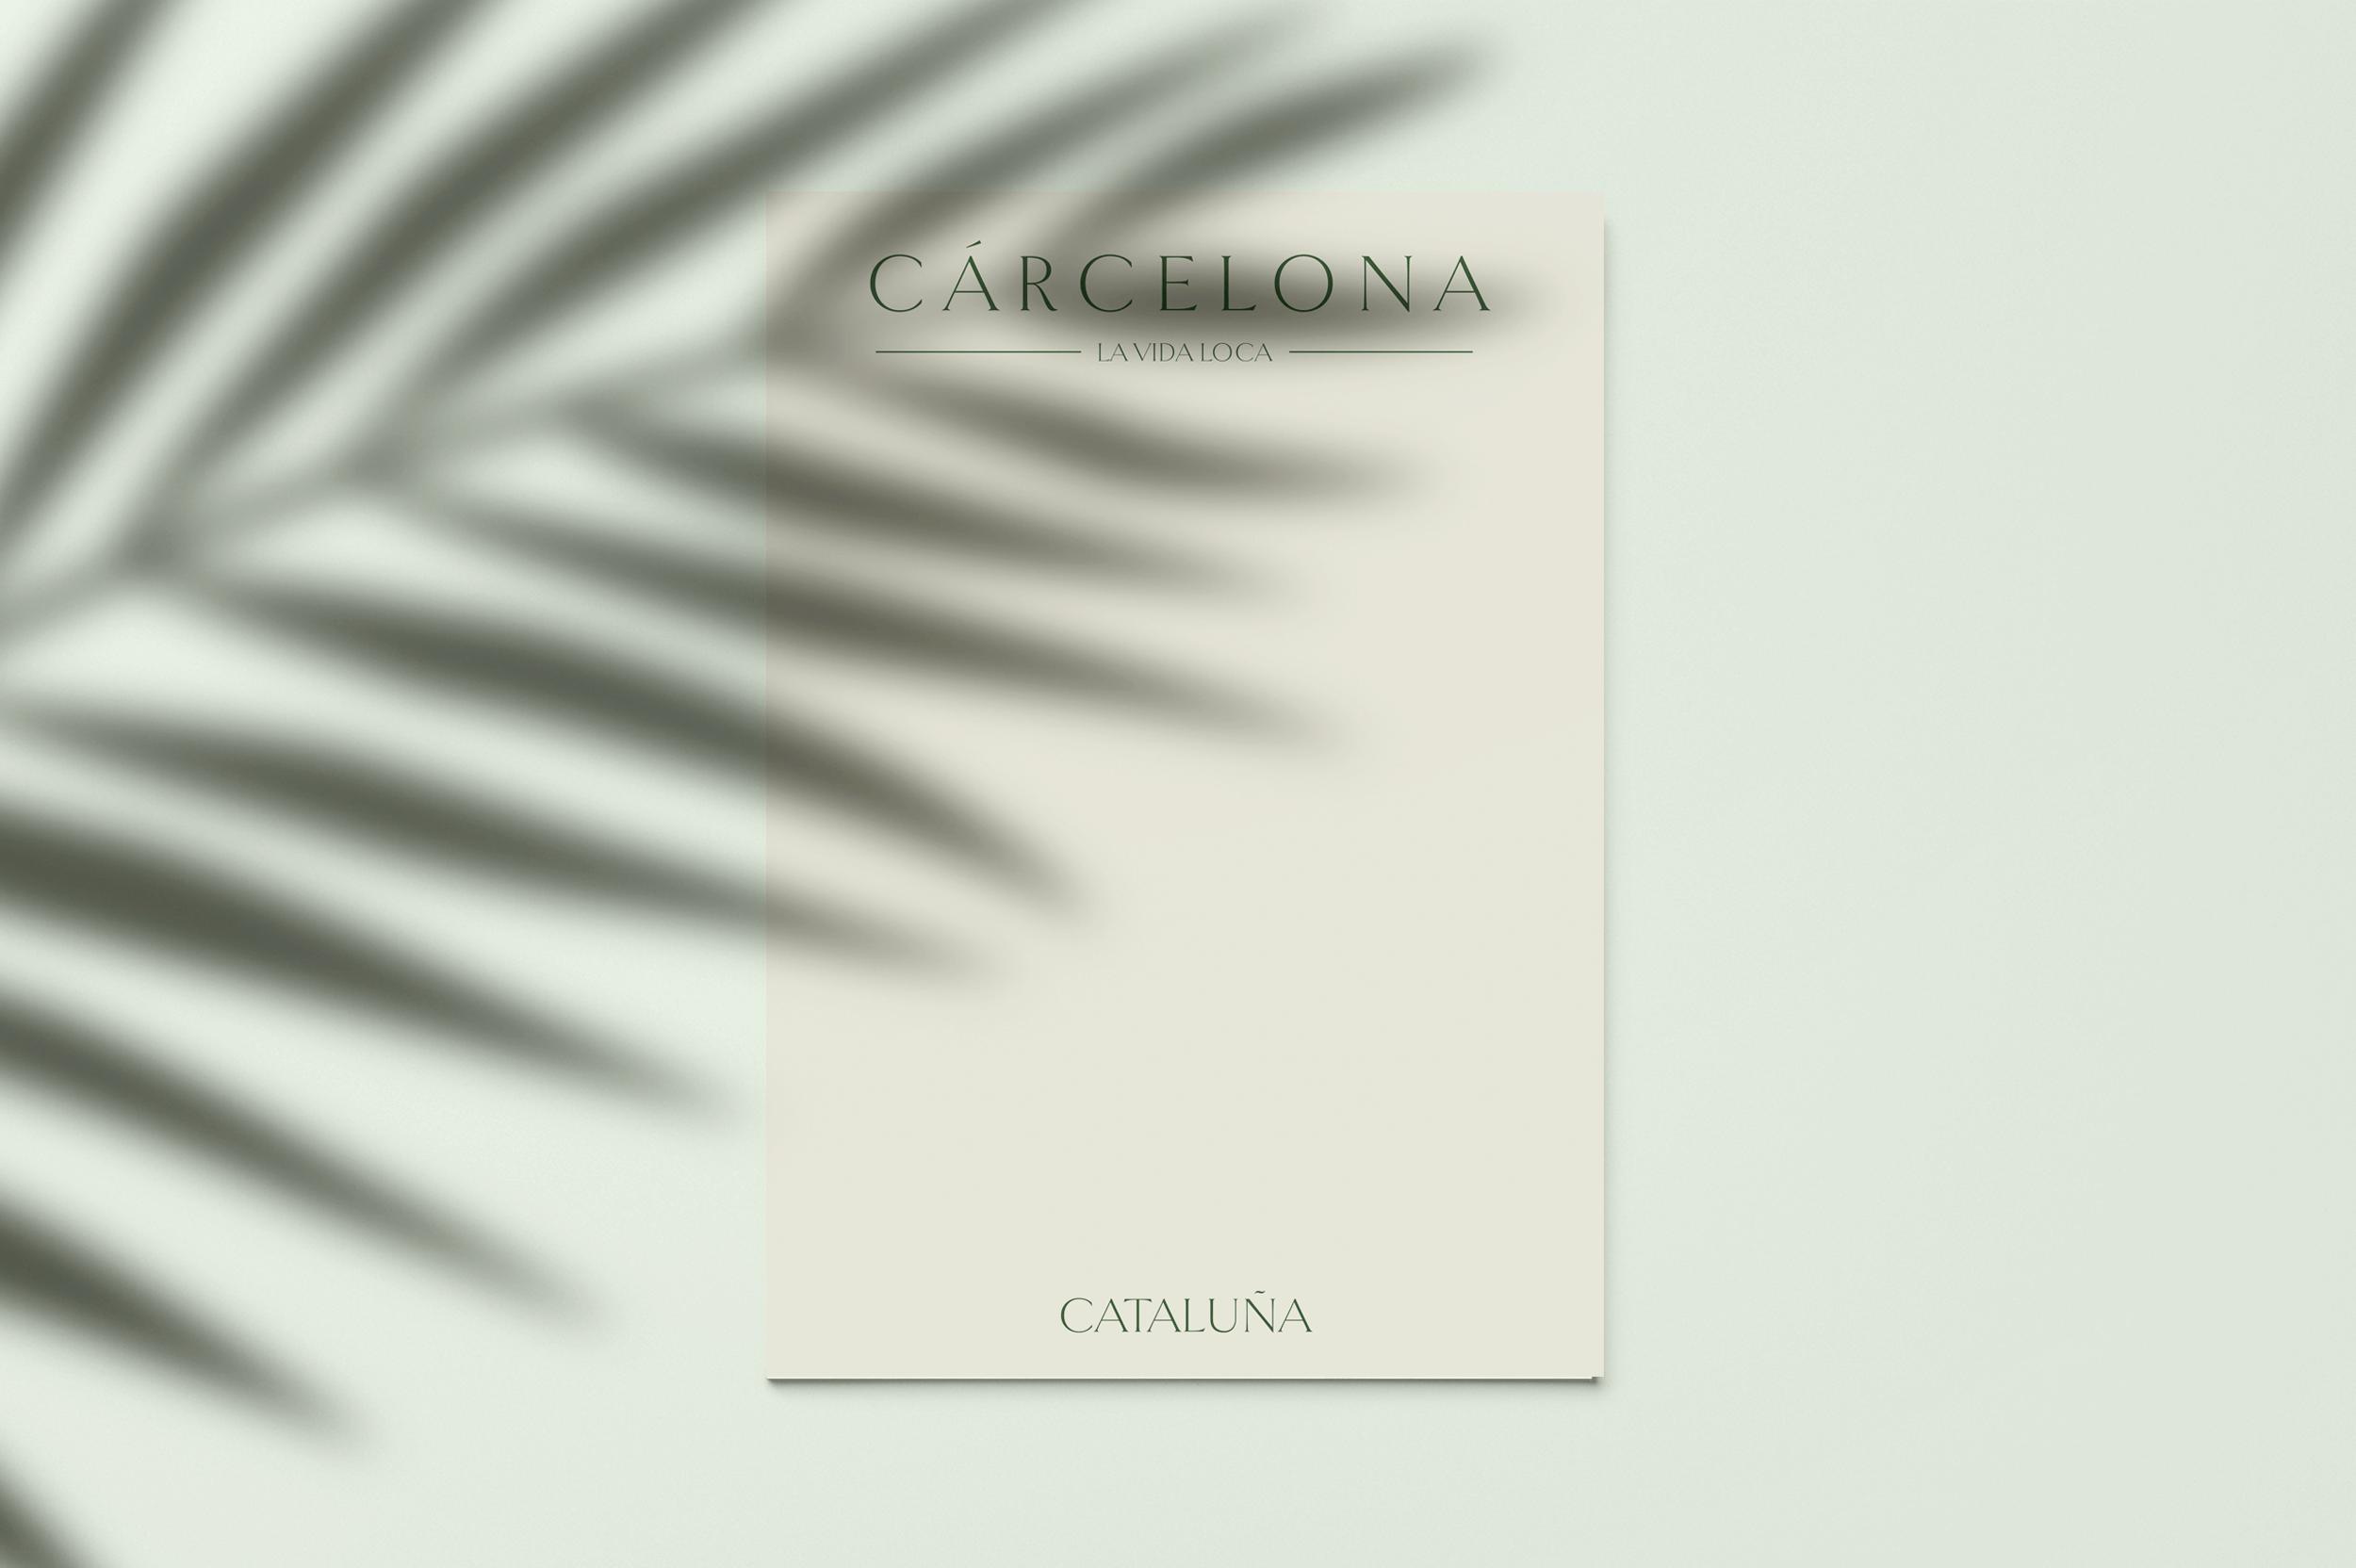 Cárcelona Branding // Phylleli Design Studio and Blog